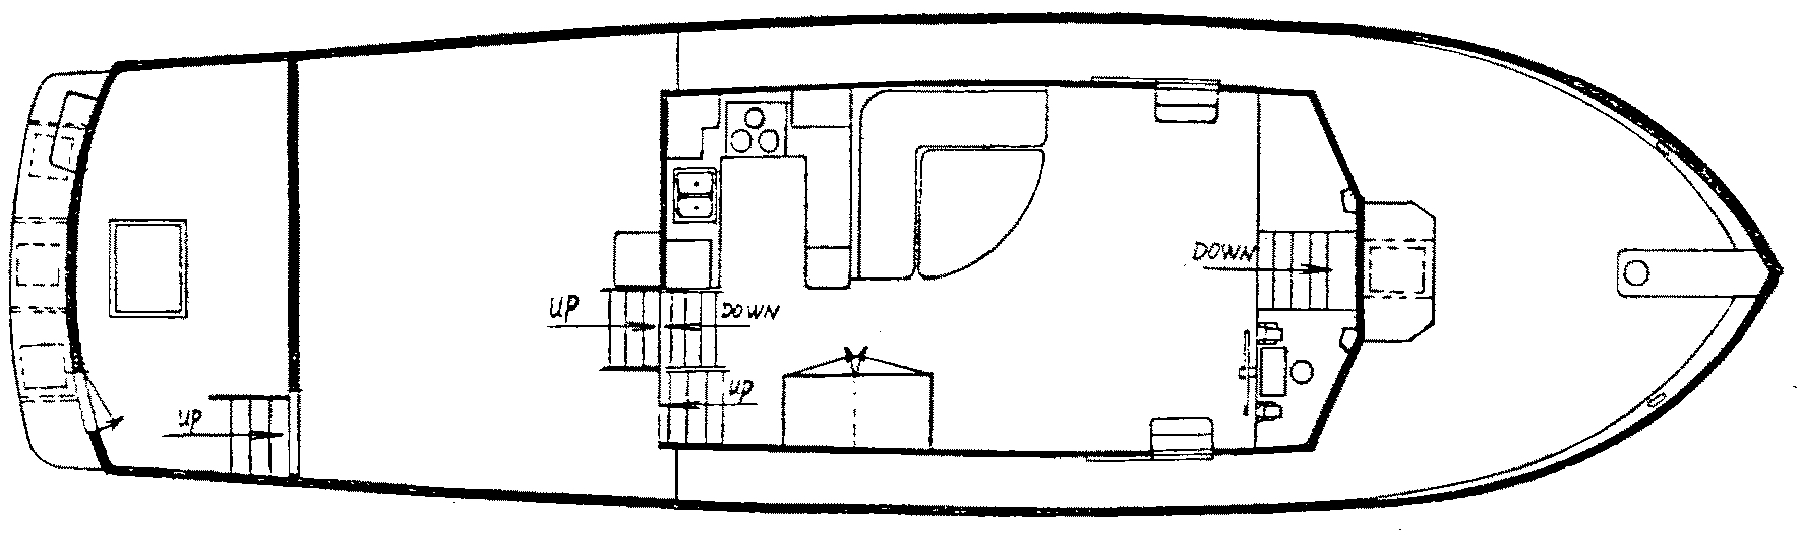 49 Cockpit Motor Yacht Floor Plan 2